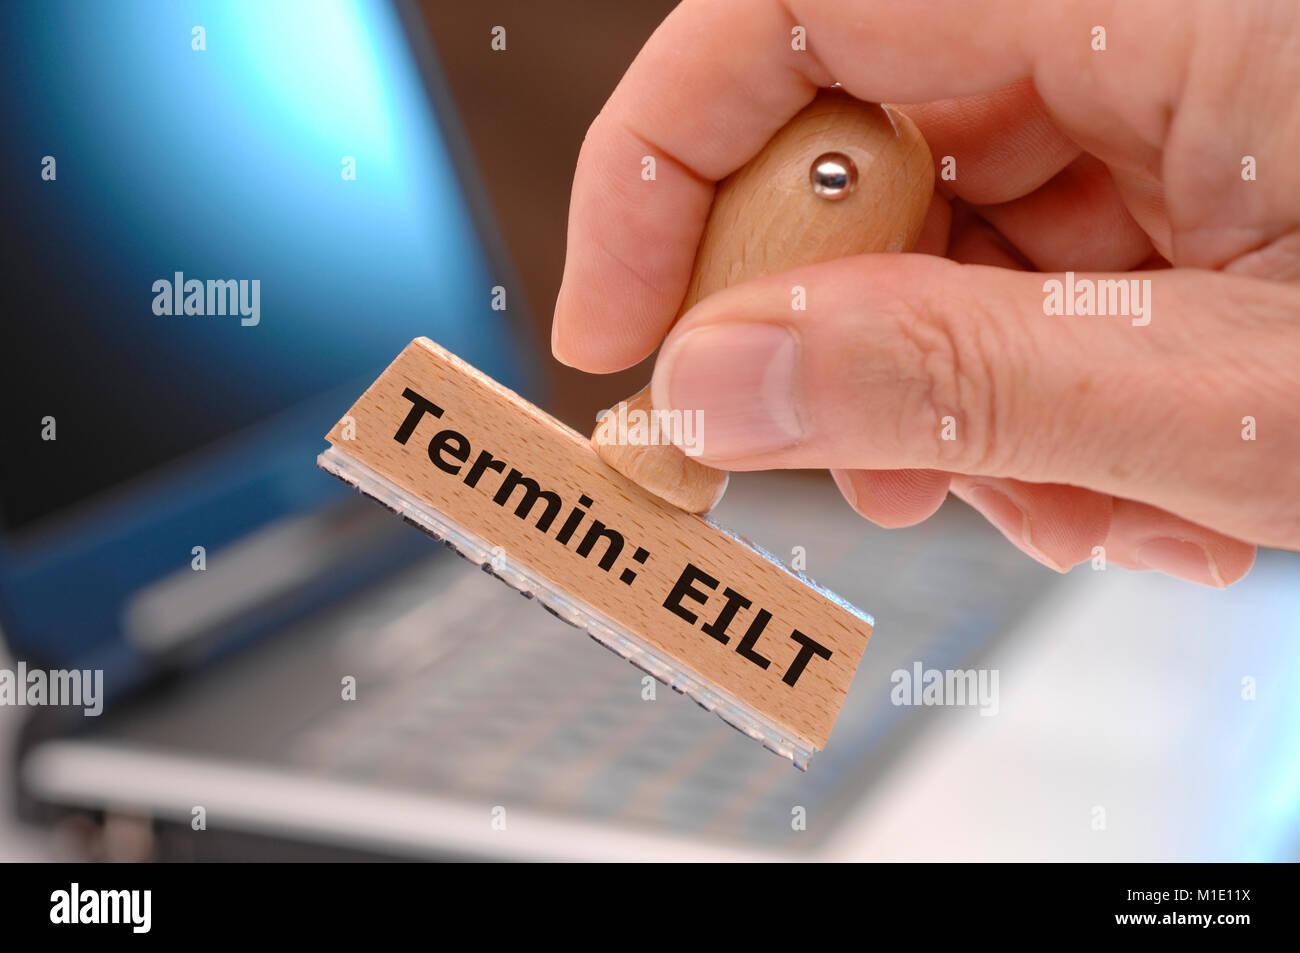 Termin EILT markiert auf Stempel - Stock Image